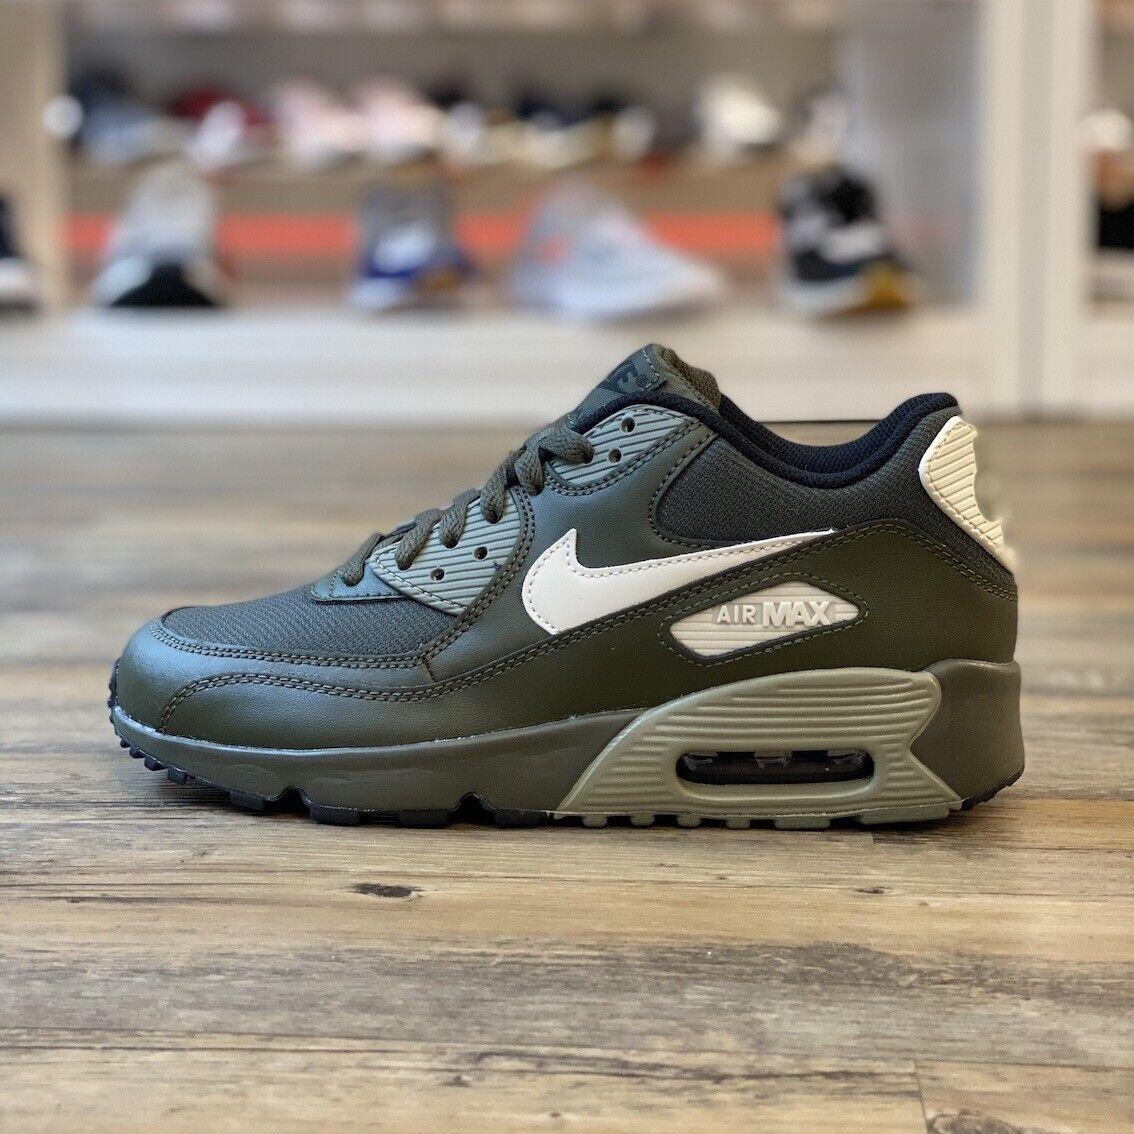 Nike Air Max 90 Gr.38,5 Chaussures Baskets Vert 833418 302